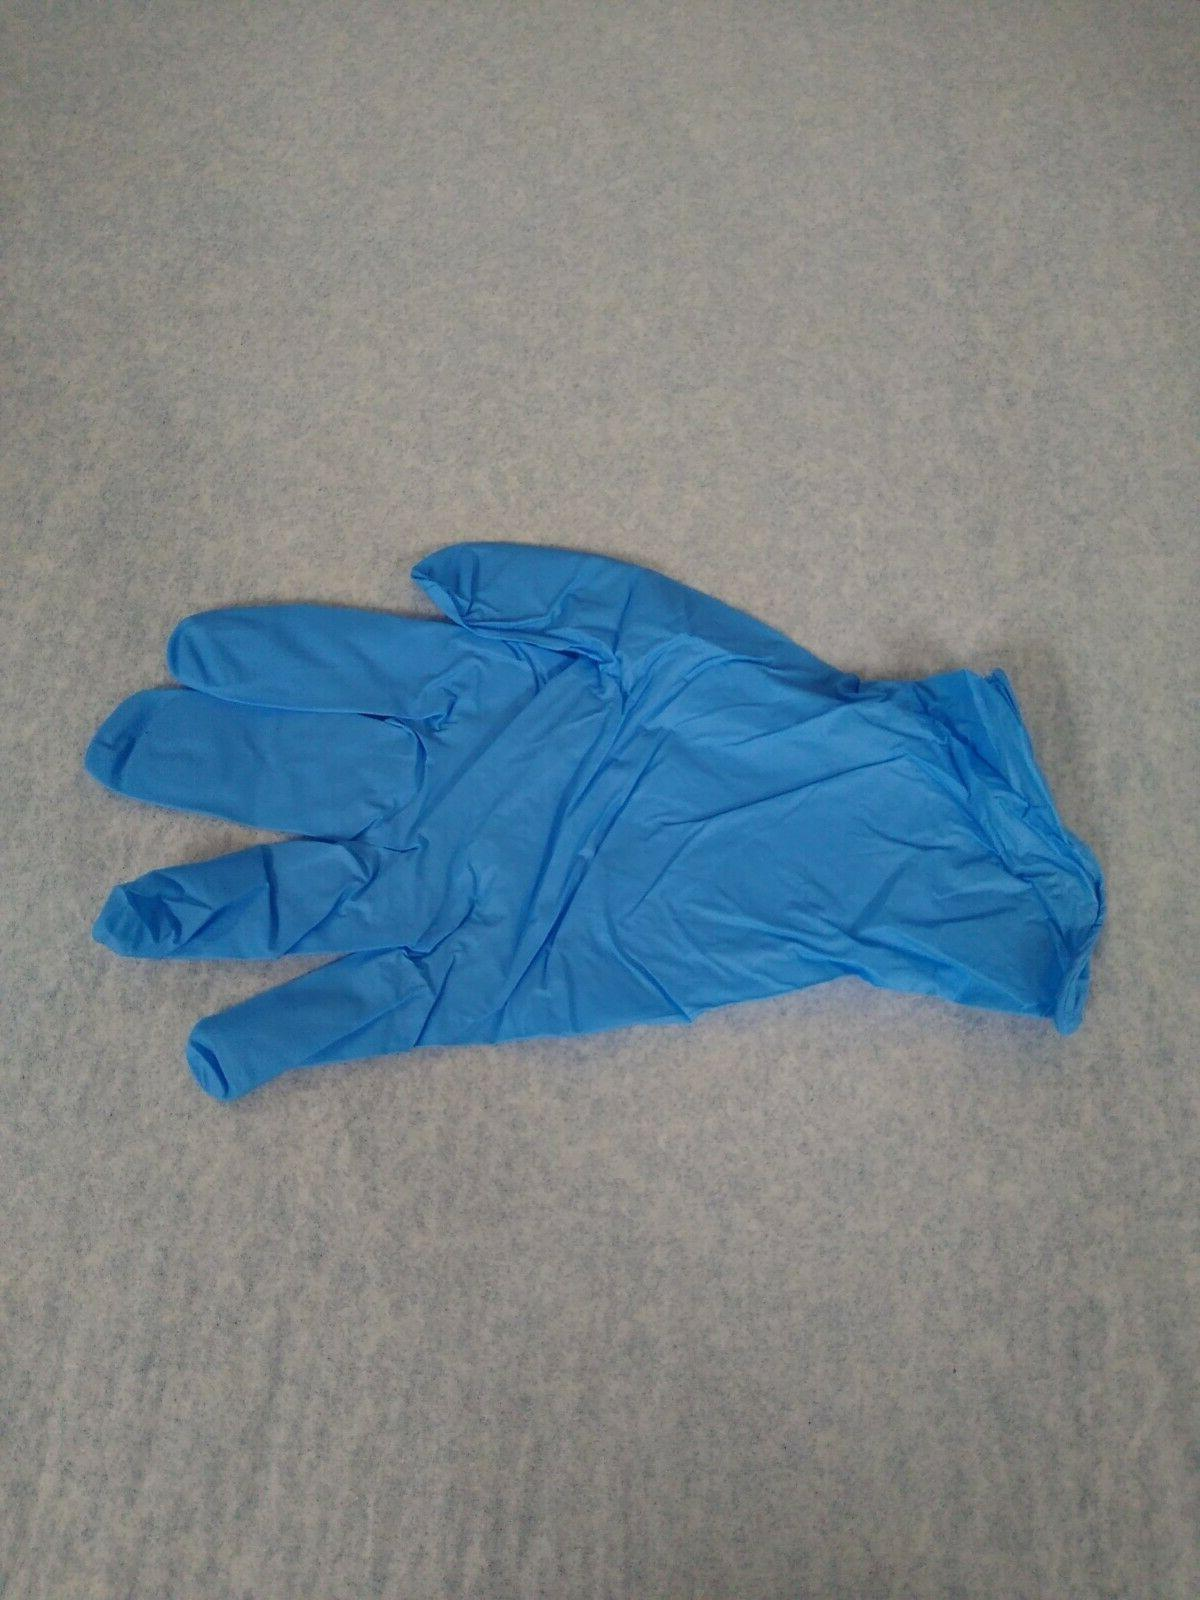 McKesson Gloves, of 100 gloves